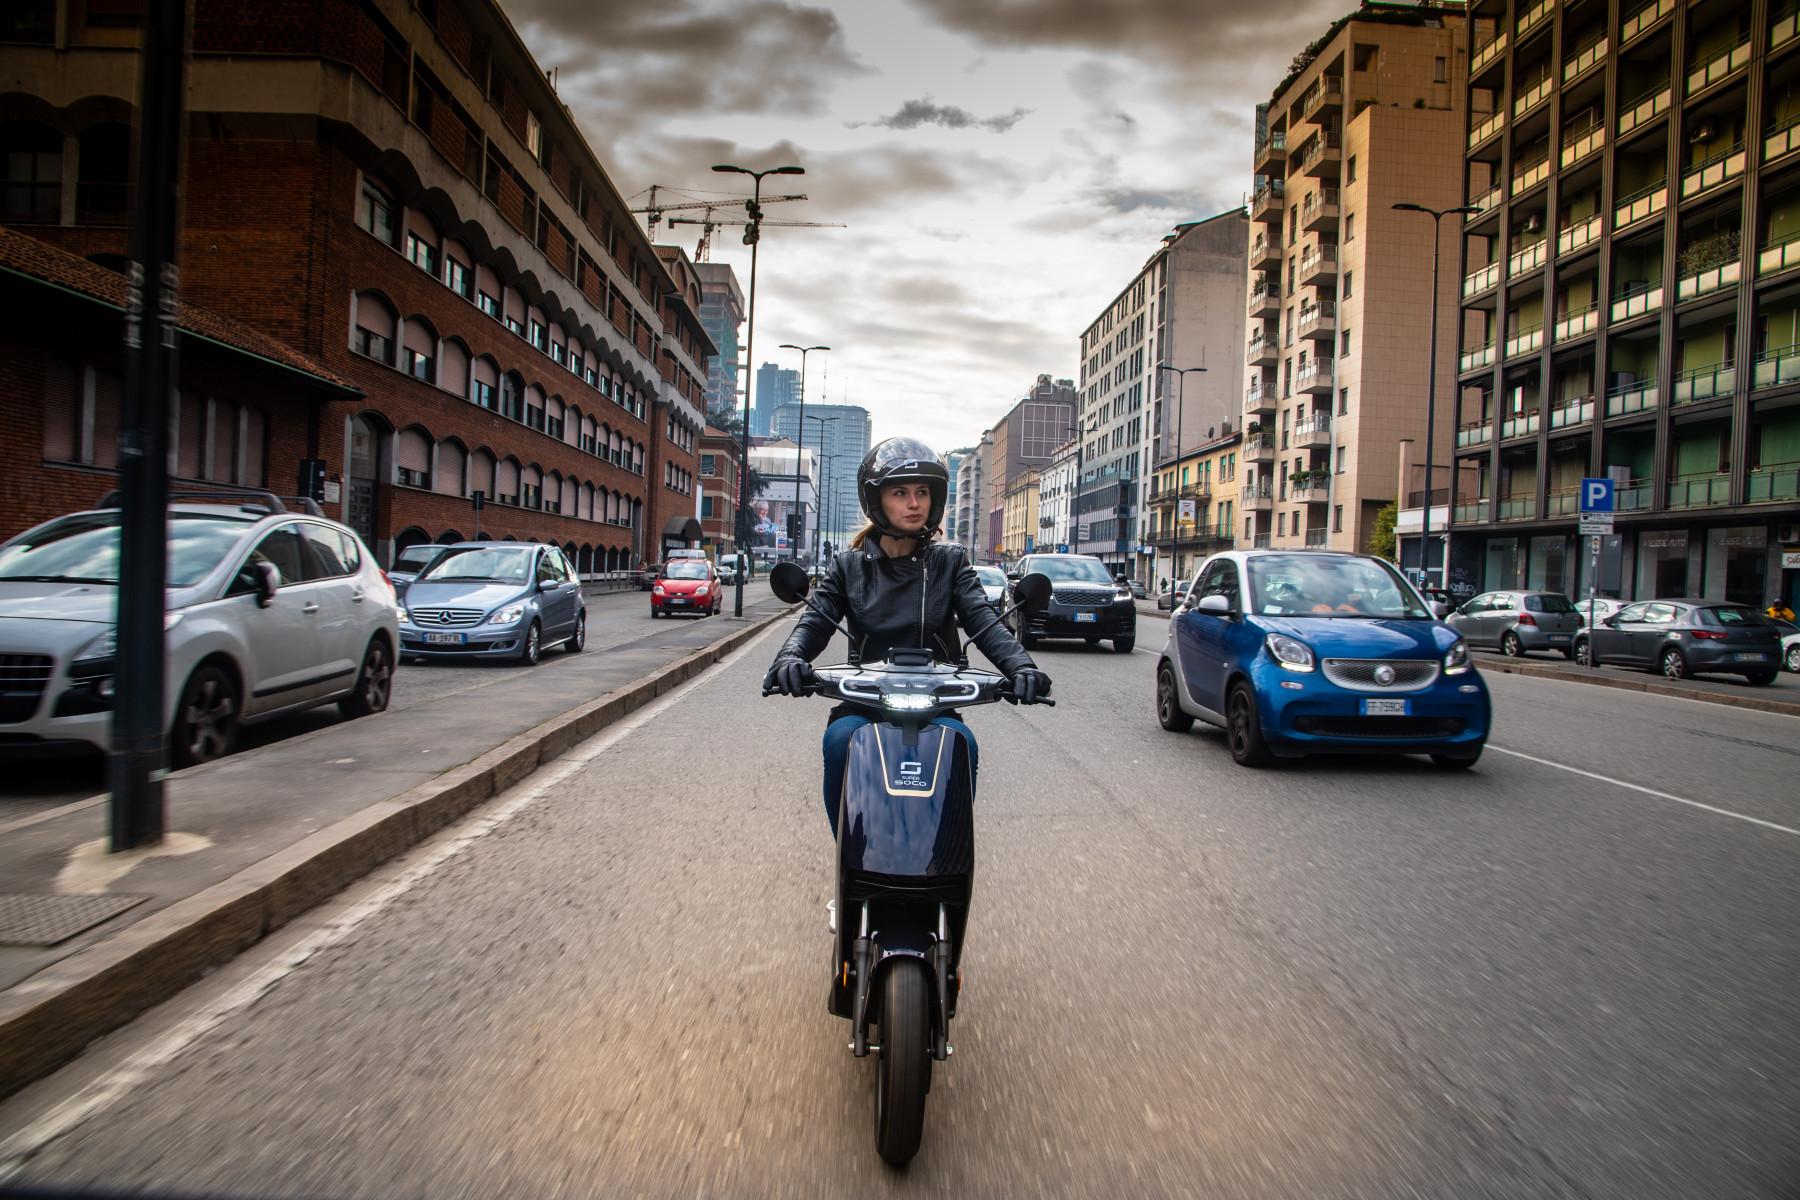 Super Soco CUx electric scooter in Milan